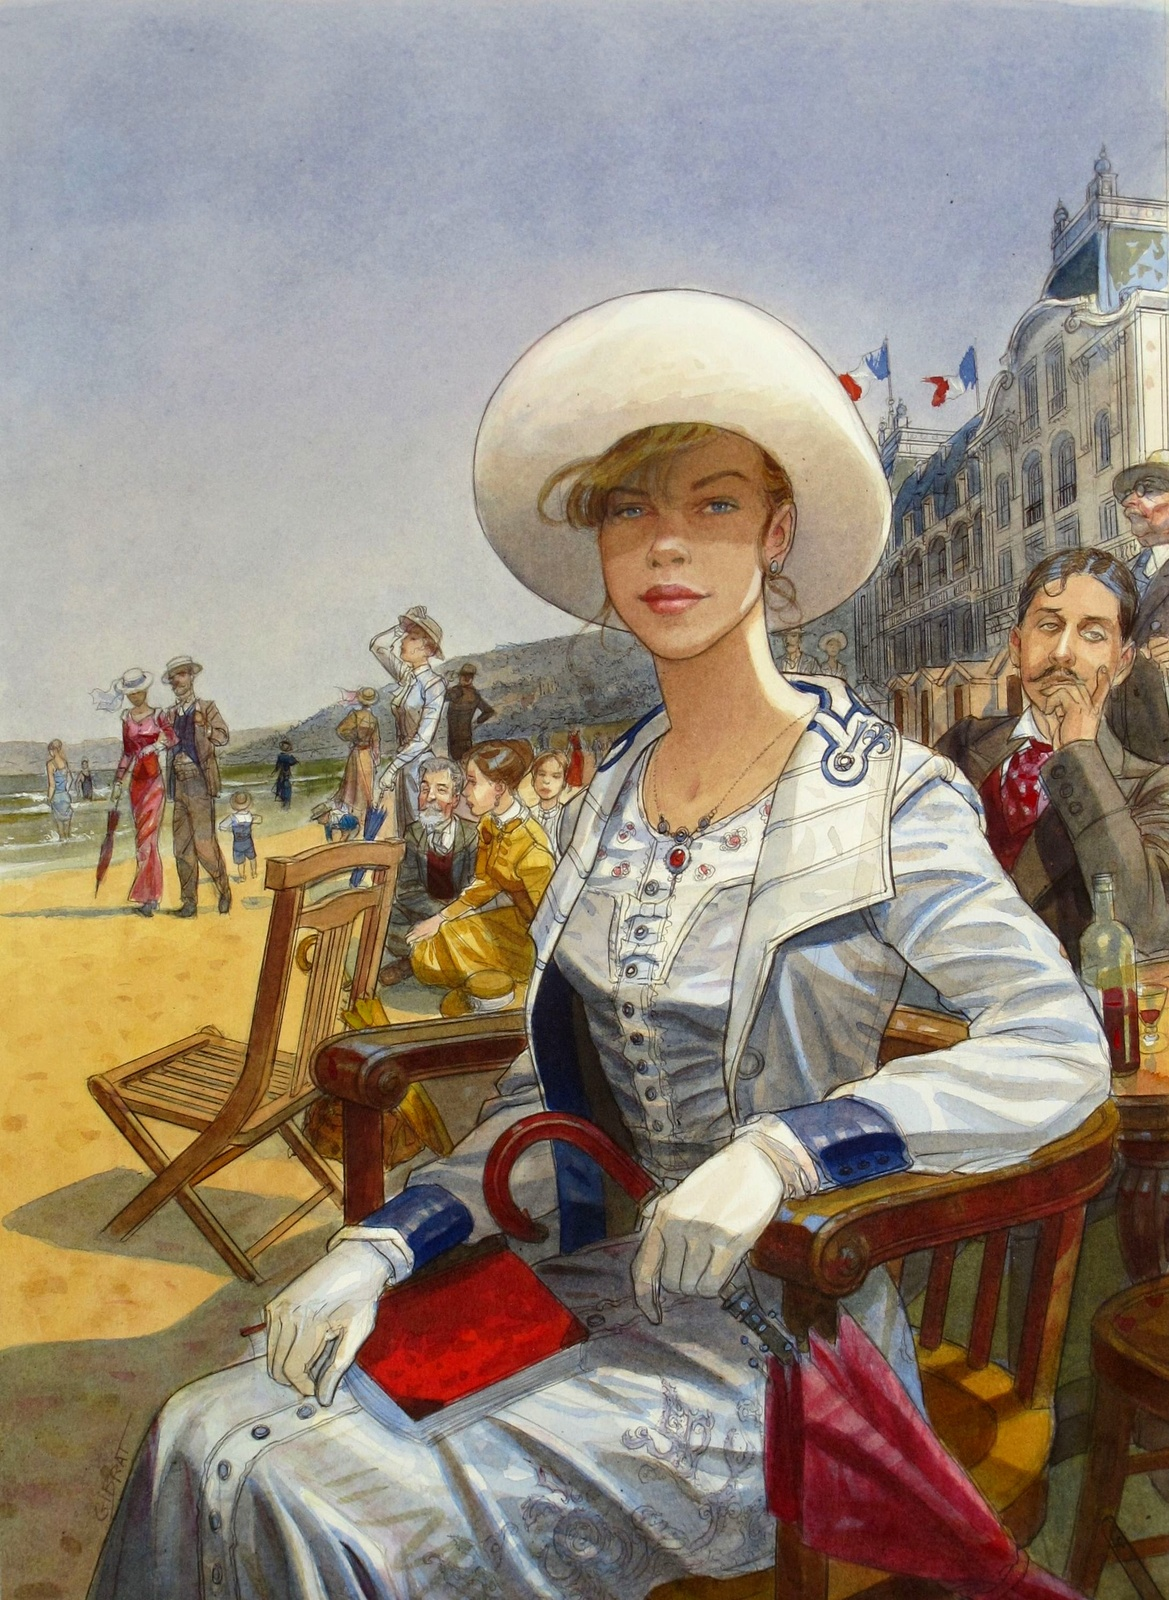 2012_Плакат (Affiche pour les journees Musicales Marcel Proust (Cabourg 2012)_35 х 48.5_акварель_Частное собрание.jpg